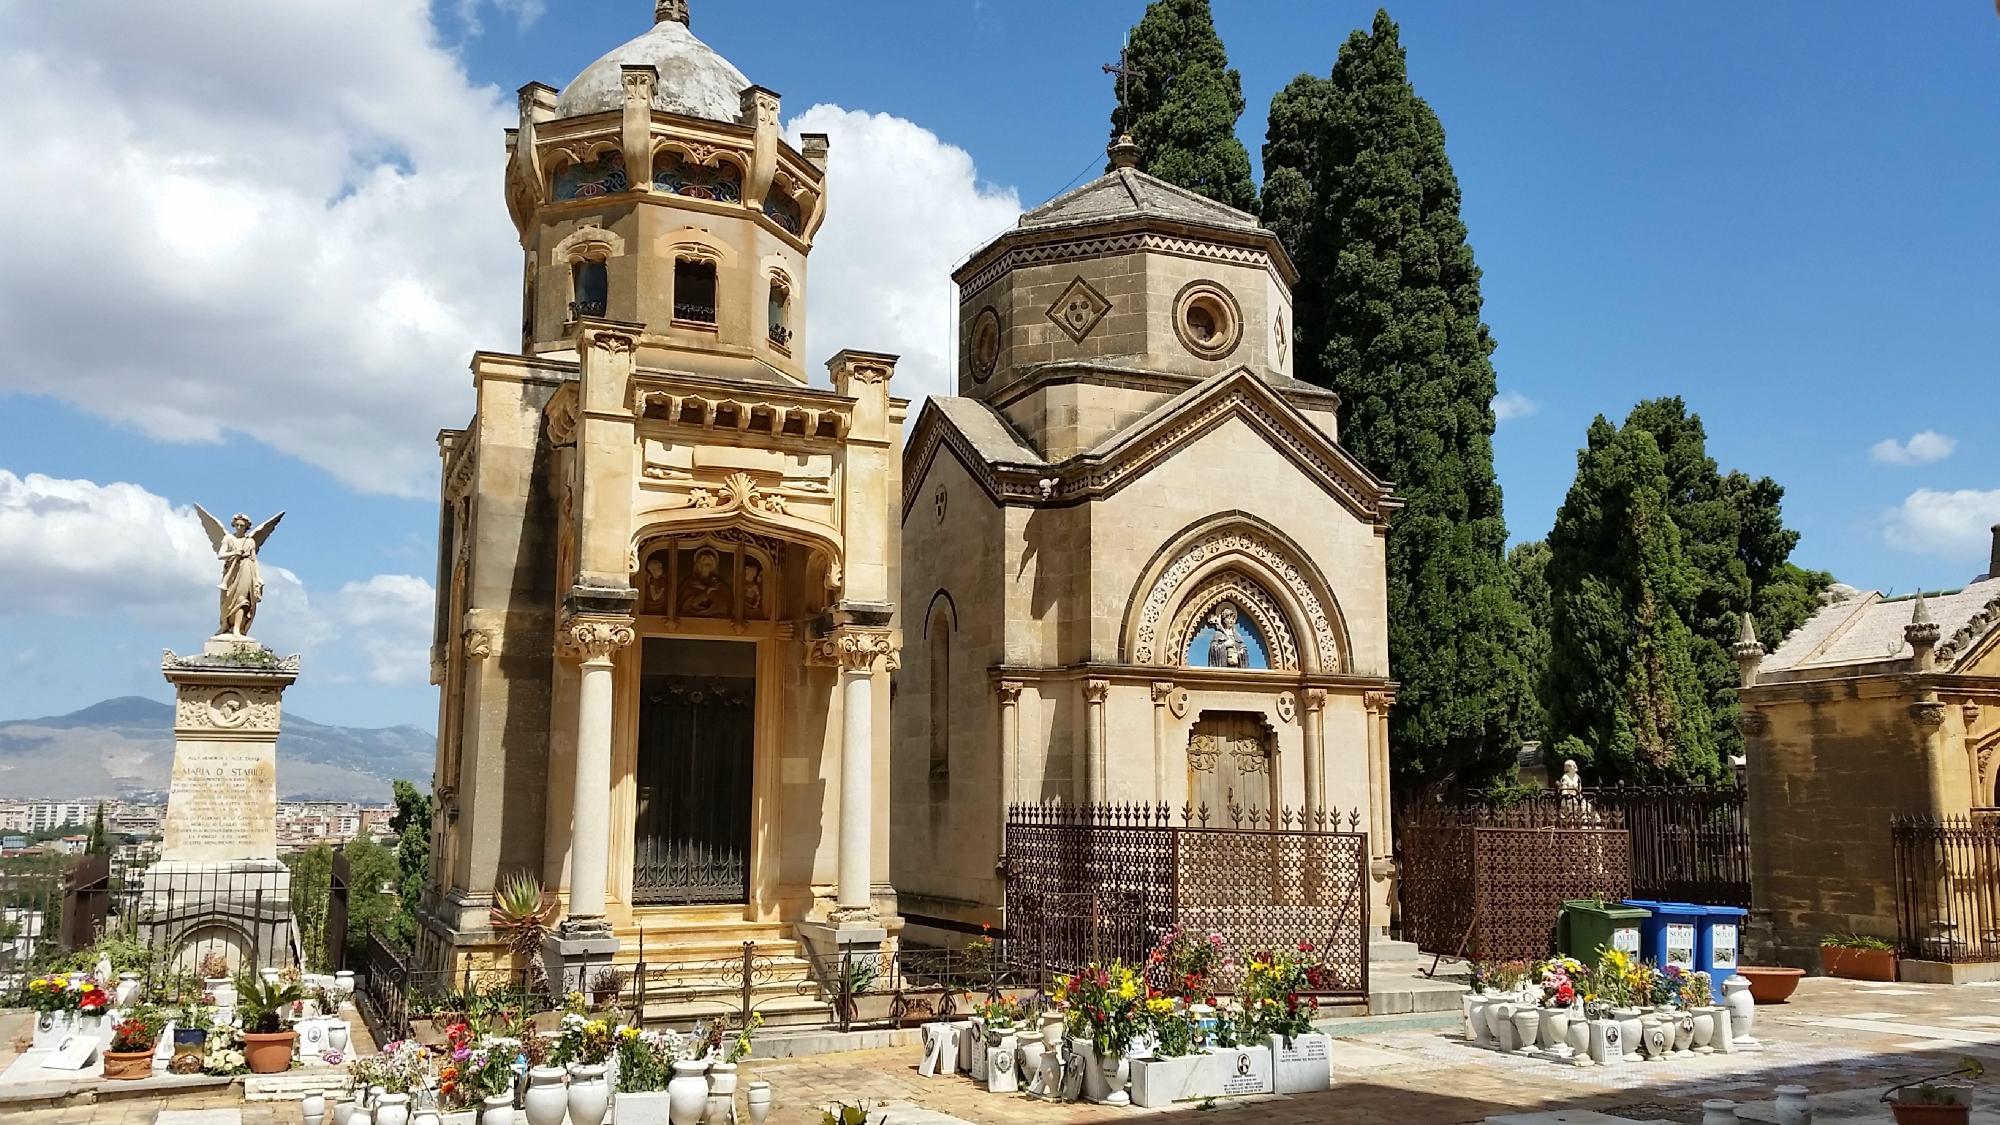 Convento Santa Maria di Gesù